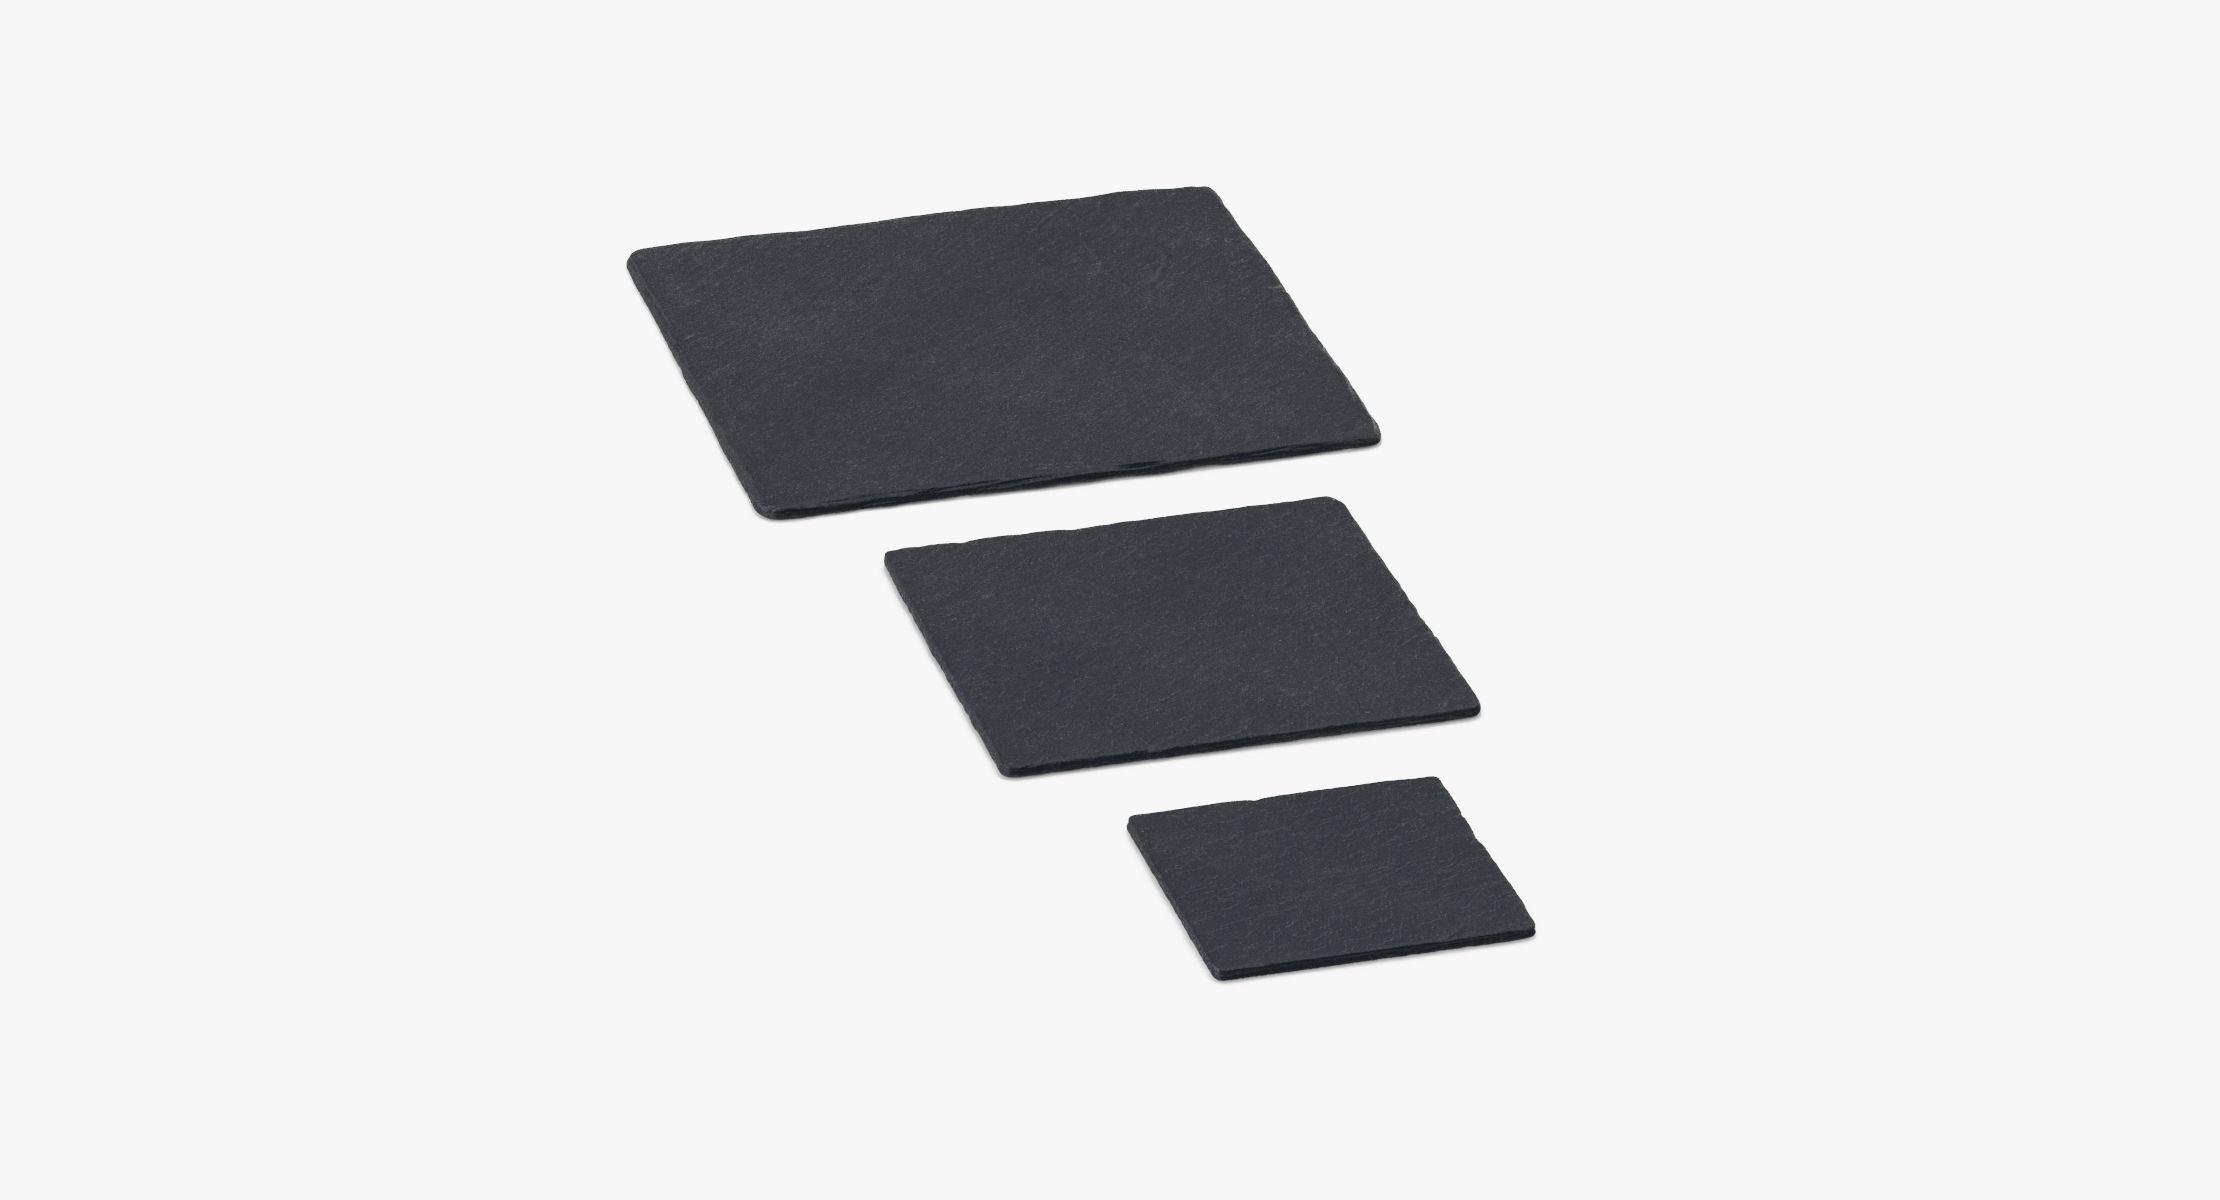 Slate Servng Plate Square - reel 1